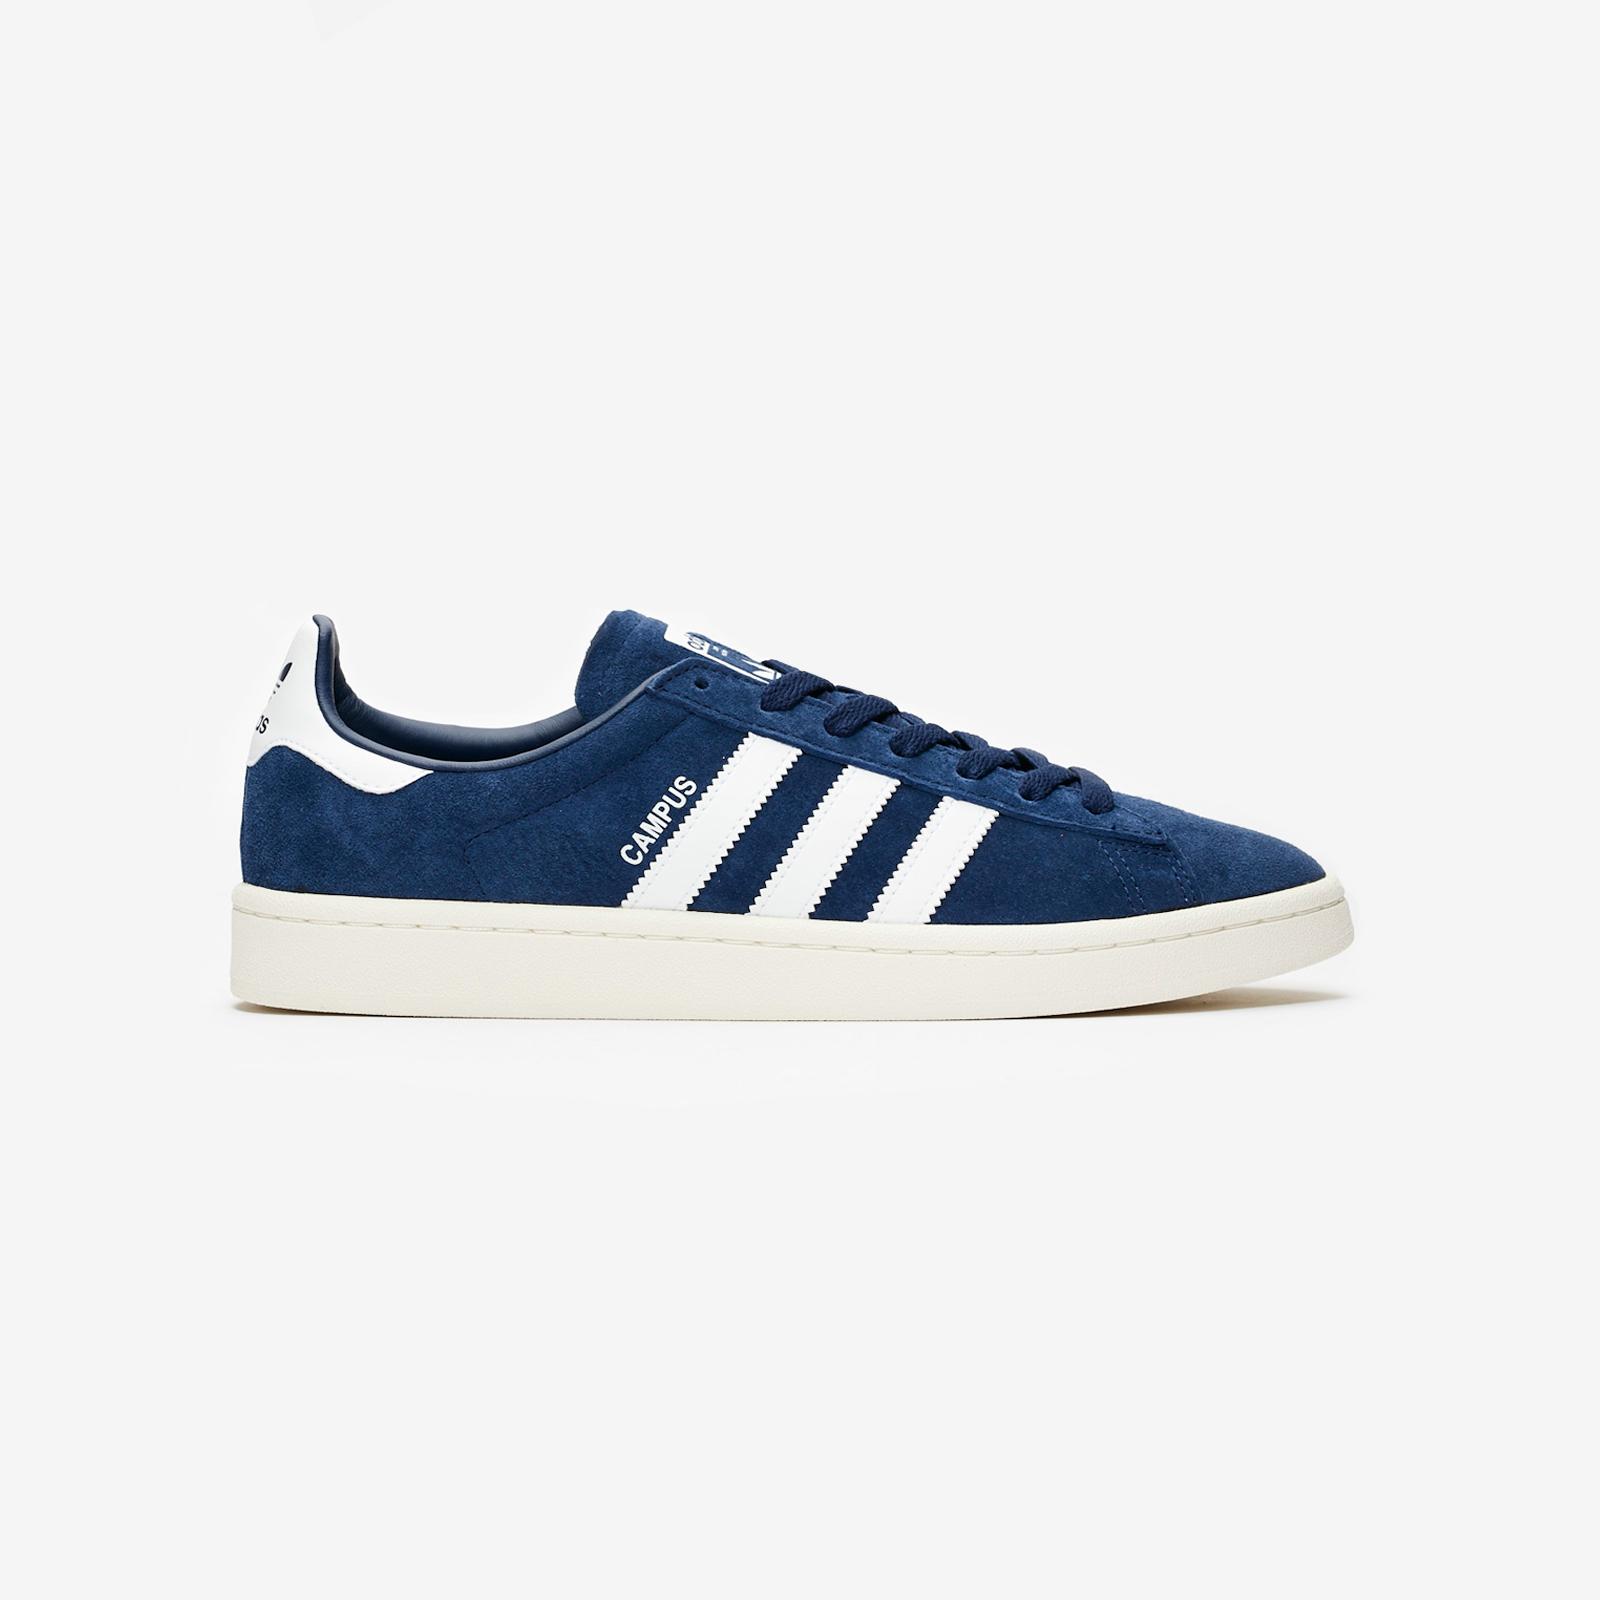 adidas Campus - Bz0086 - Sneakersnstuff